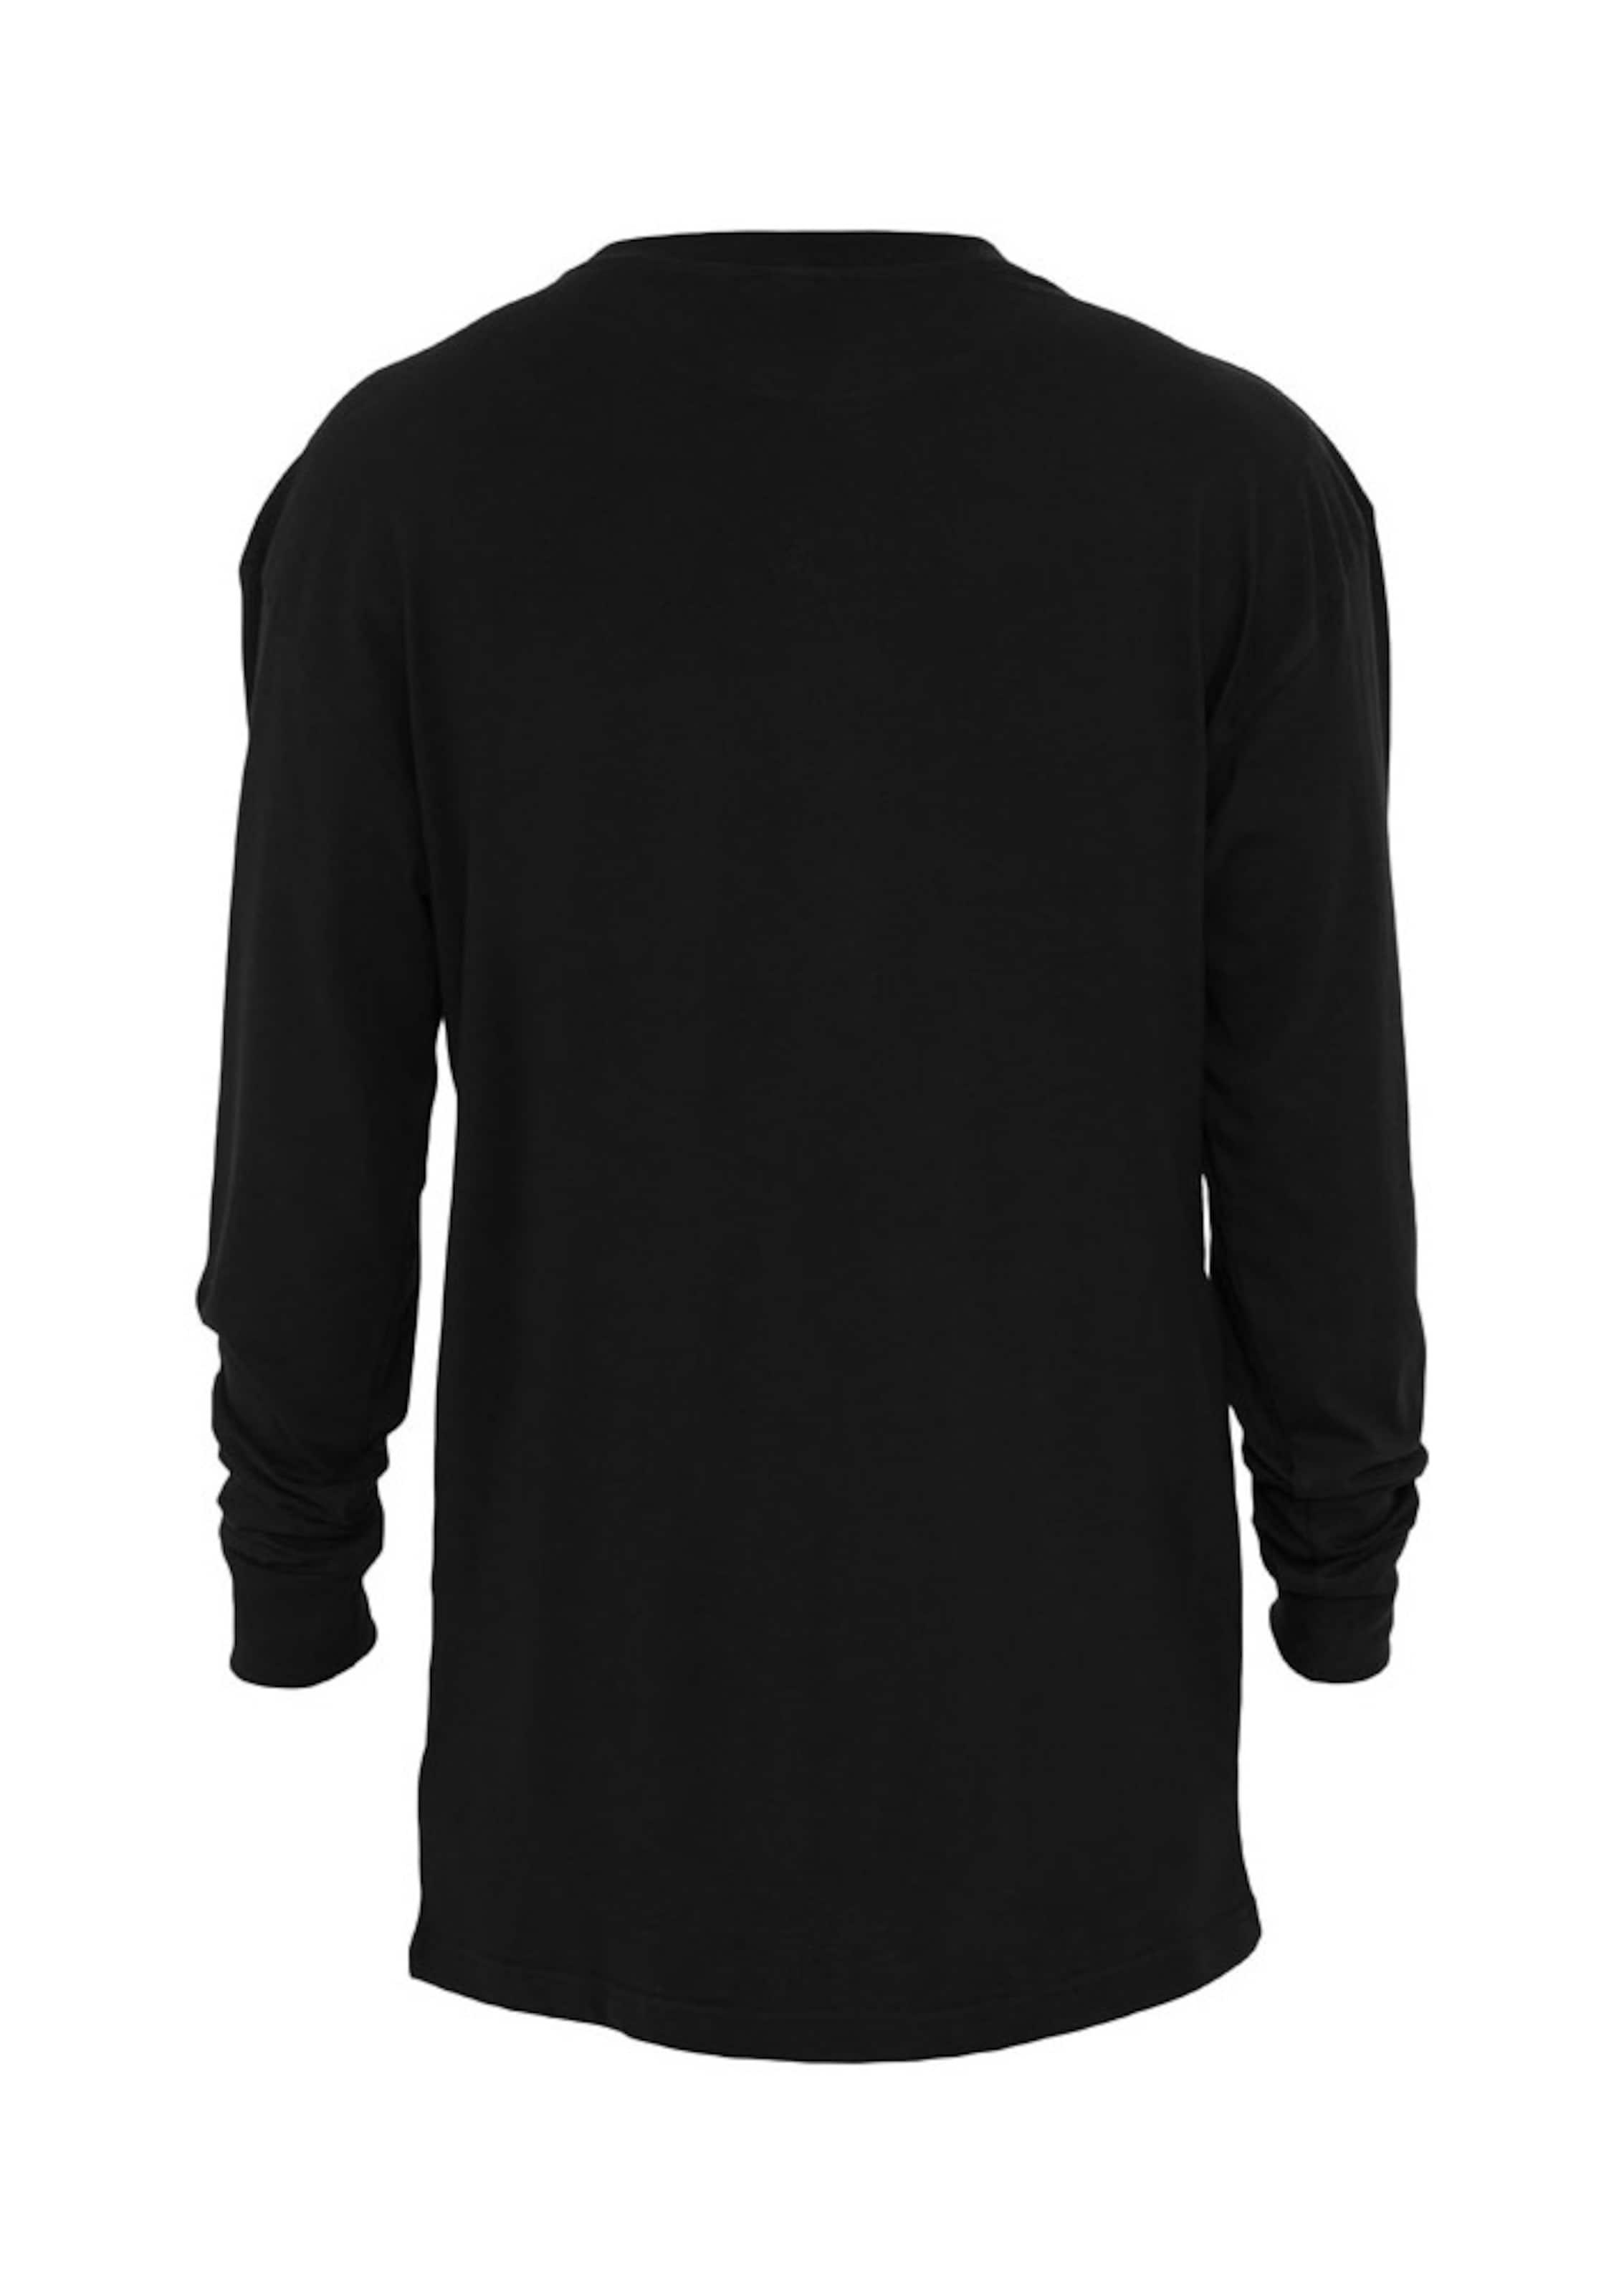 Urban Urban Urban Shirt Classics Classics In In Schwarz Shirt Schwarz FlKJ3ucT15